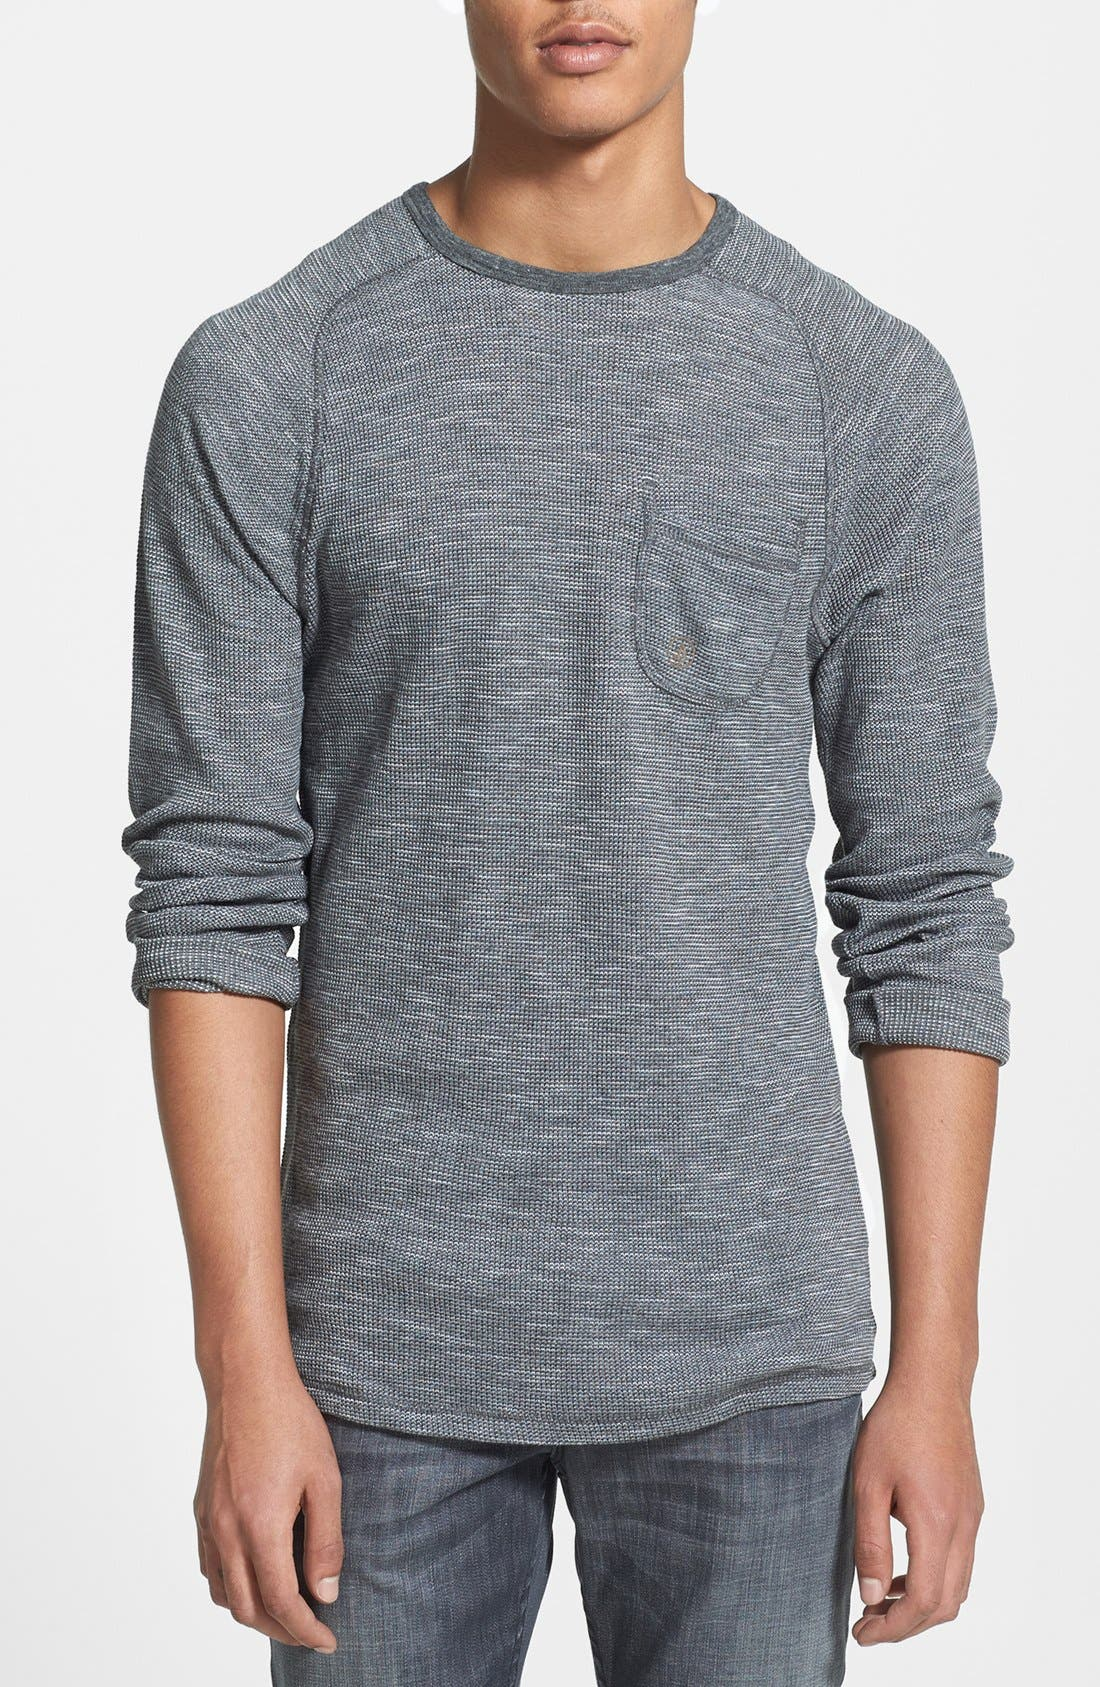 VOLCOM 'Upgrade' Slim Fit Long Sleeve Thermal Shirt, Main, color, 020